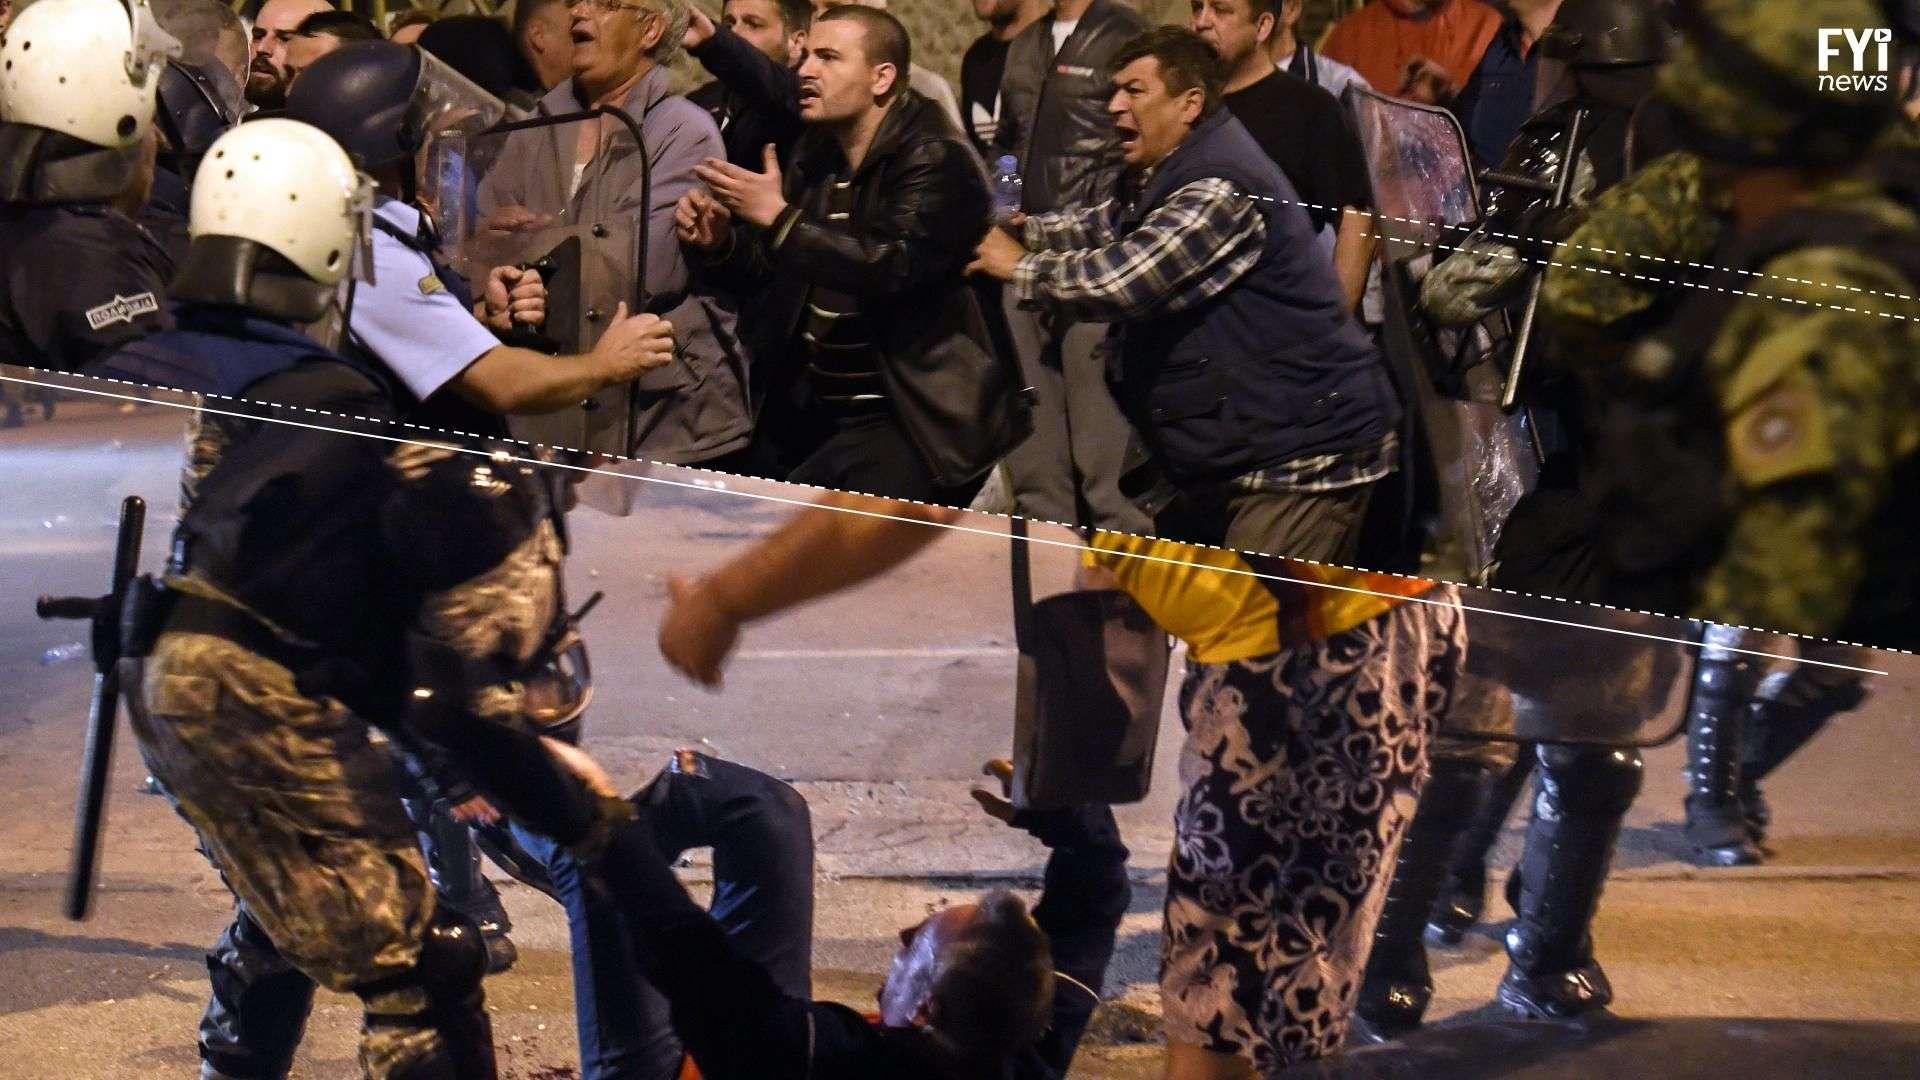 La batalla campal en el parlamento de Macedonia